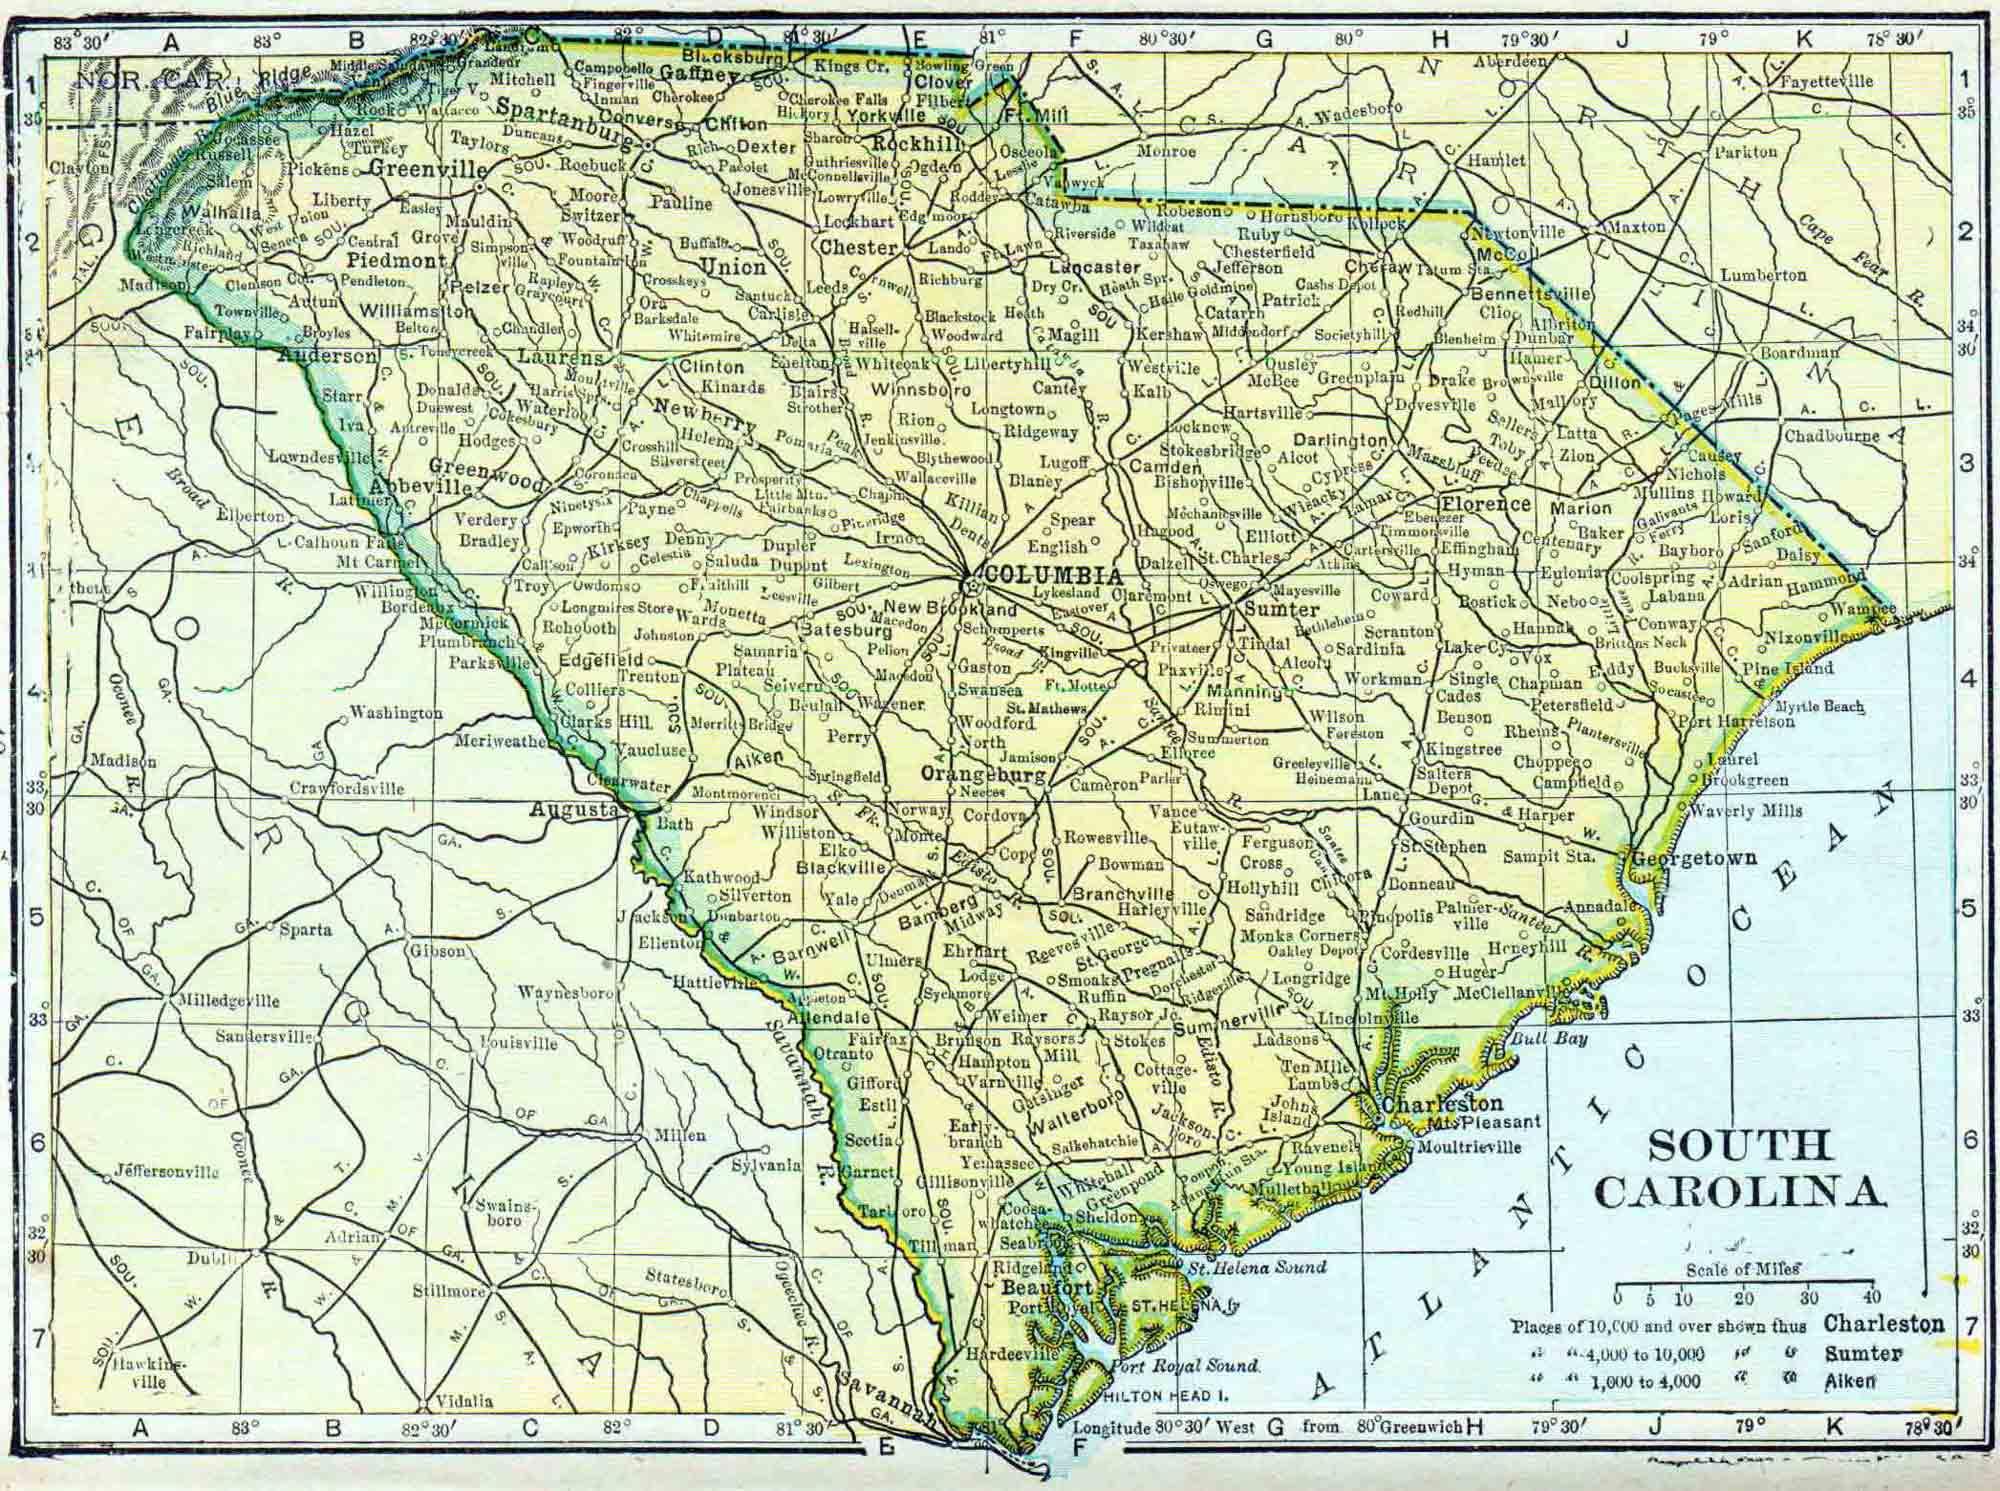 South Carolina Census Map Access Genealogy - Census us 1910 map